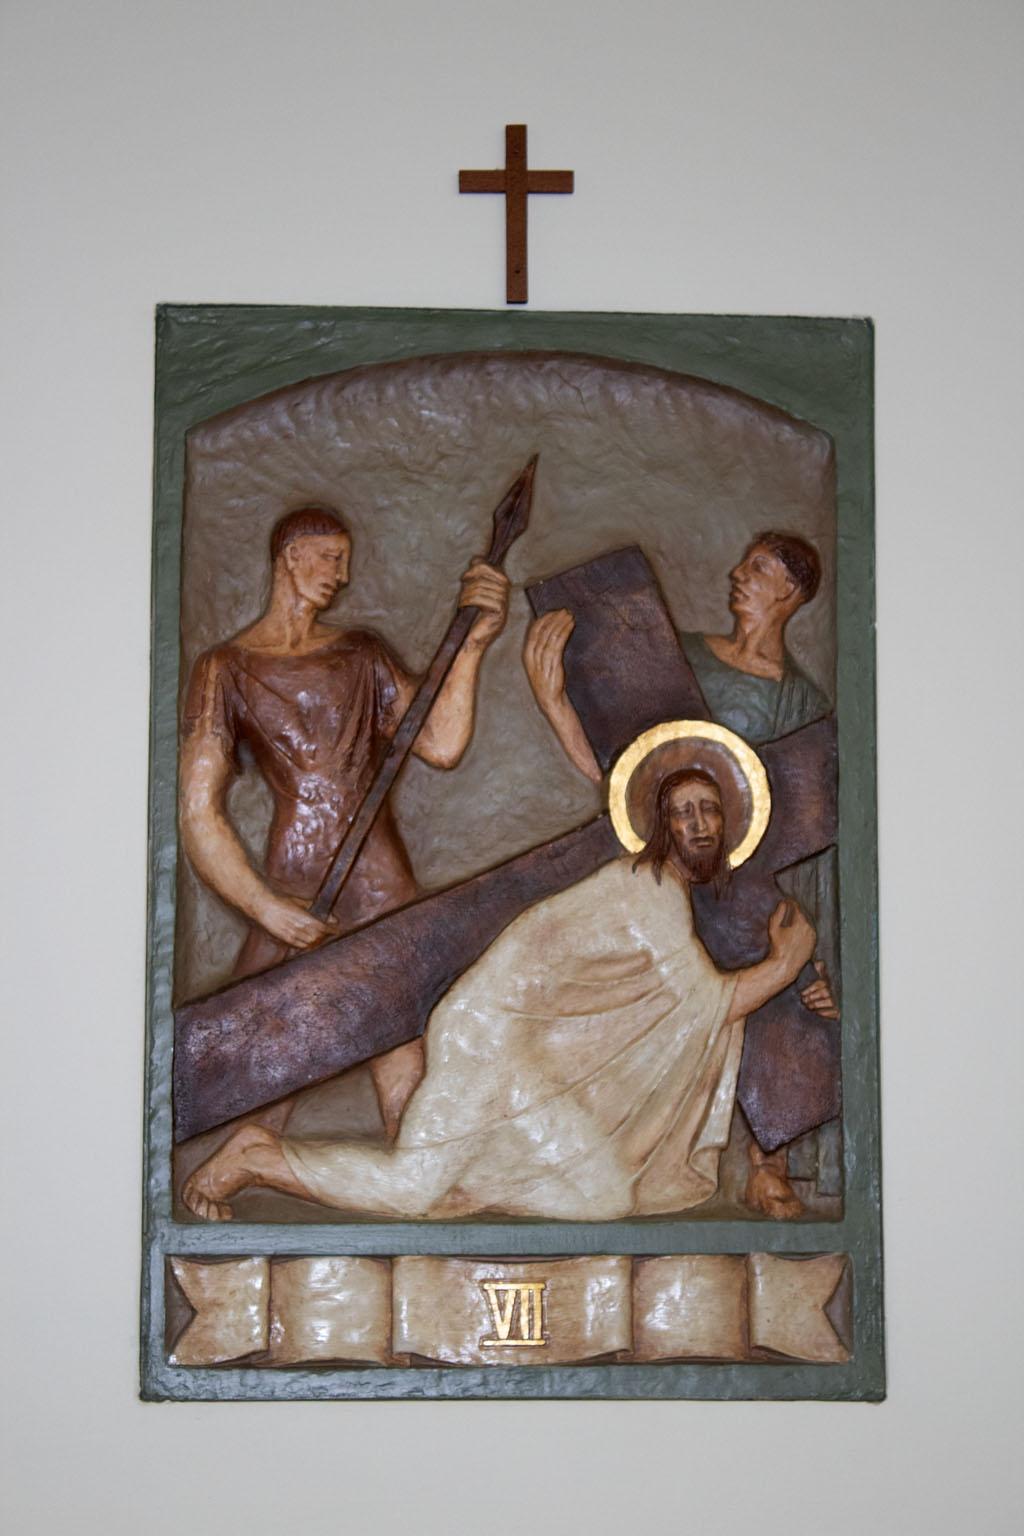 Seventh Station of the cross by Dora de Pédery Hunt